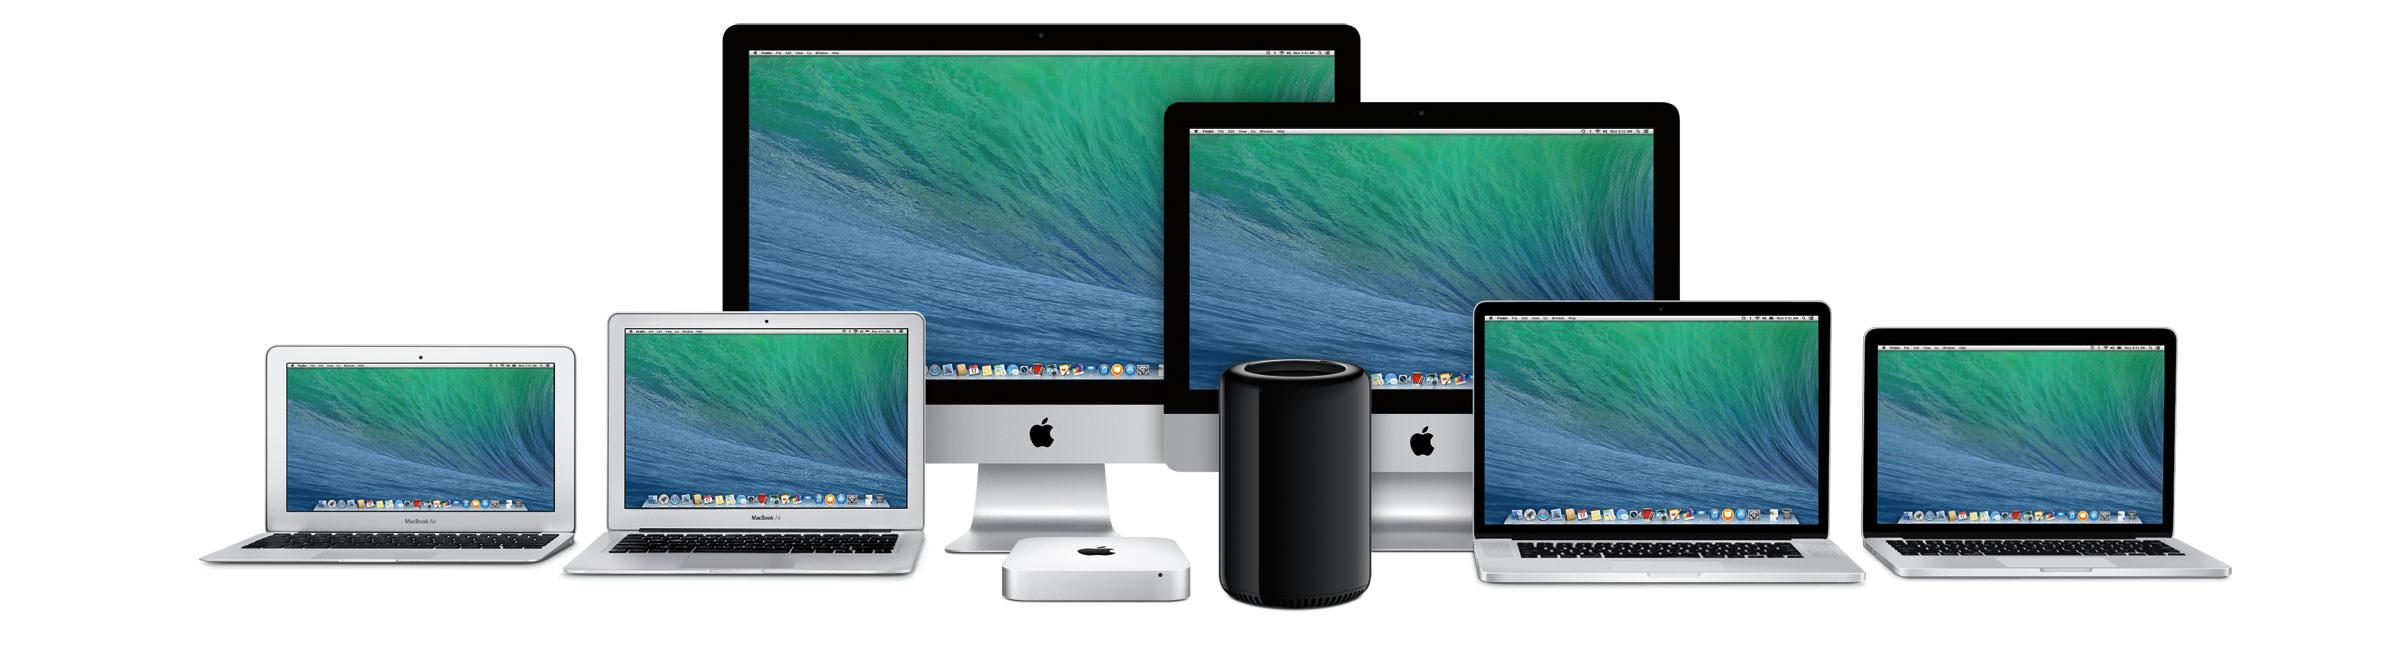 mac-repair.jpg